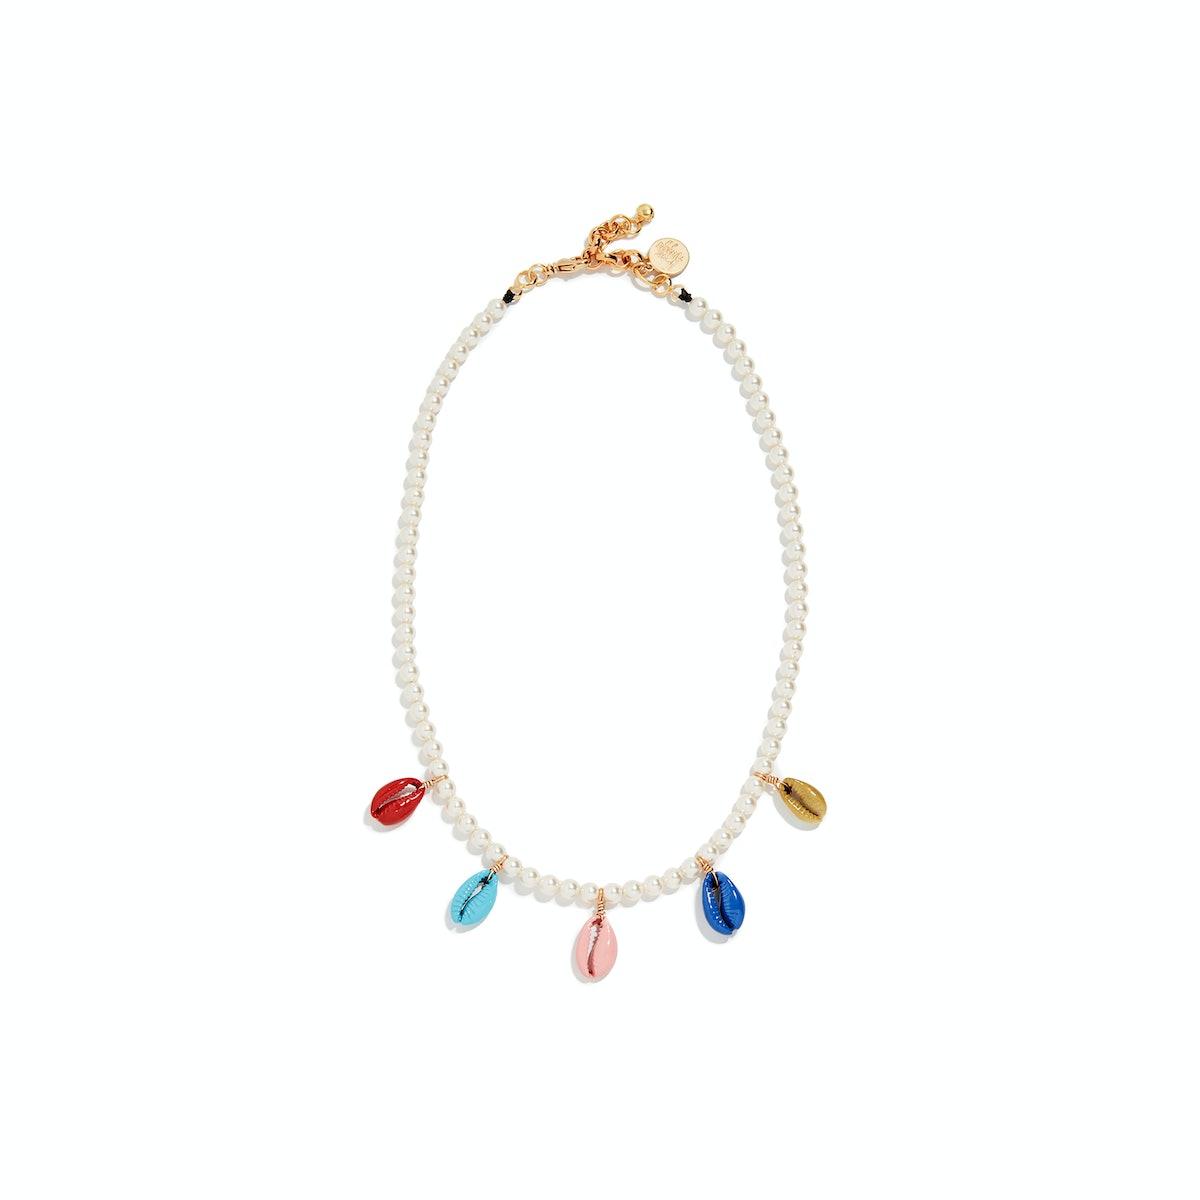 Shell_Jewelry13.jpg